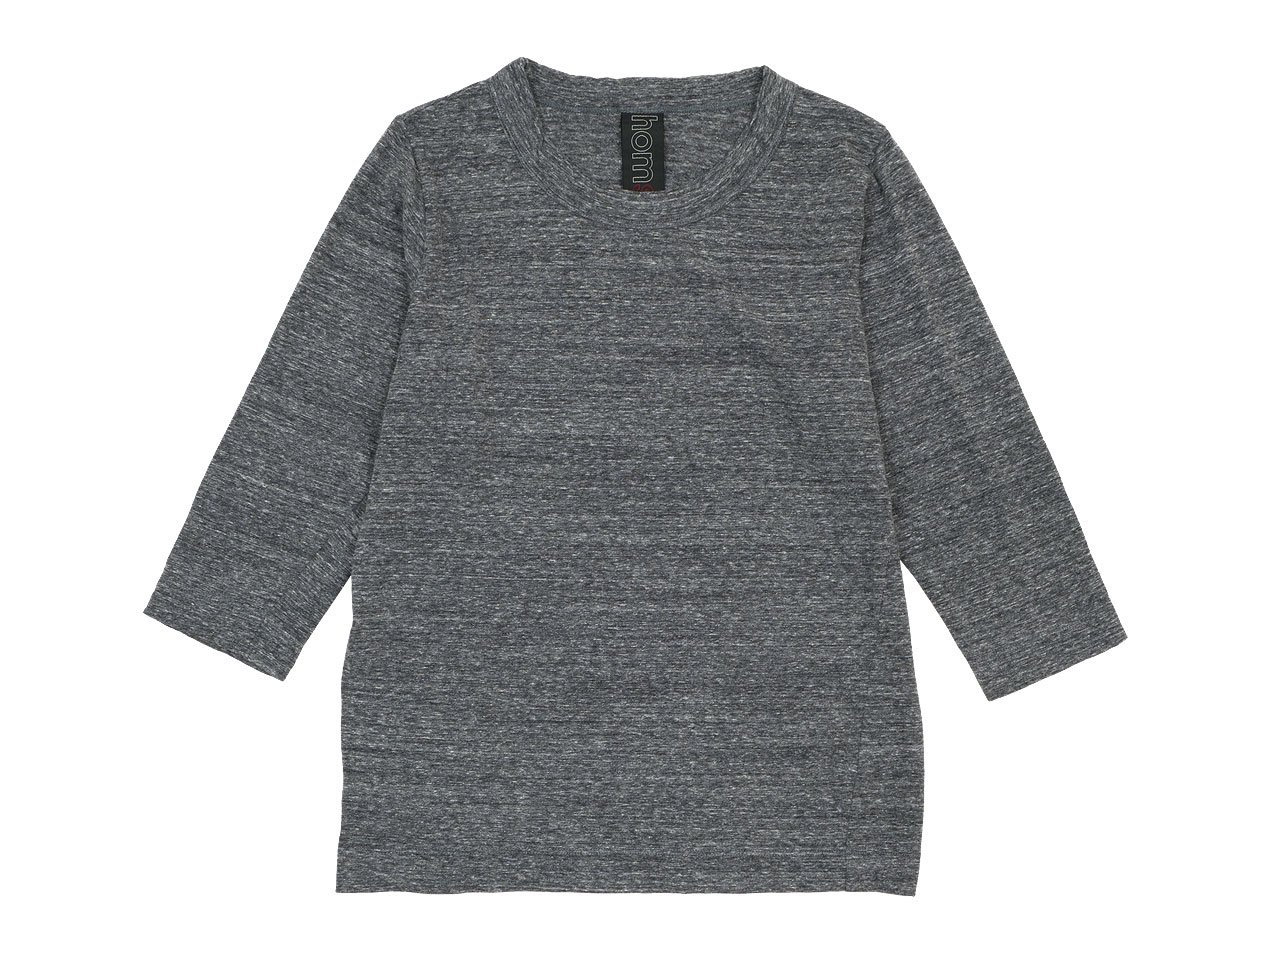 homspun 30/1天竺 七分袖Tシャツ 粗挽杢チャコール